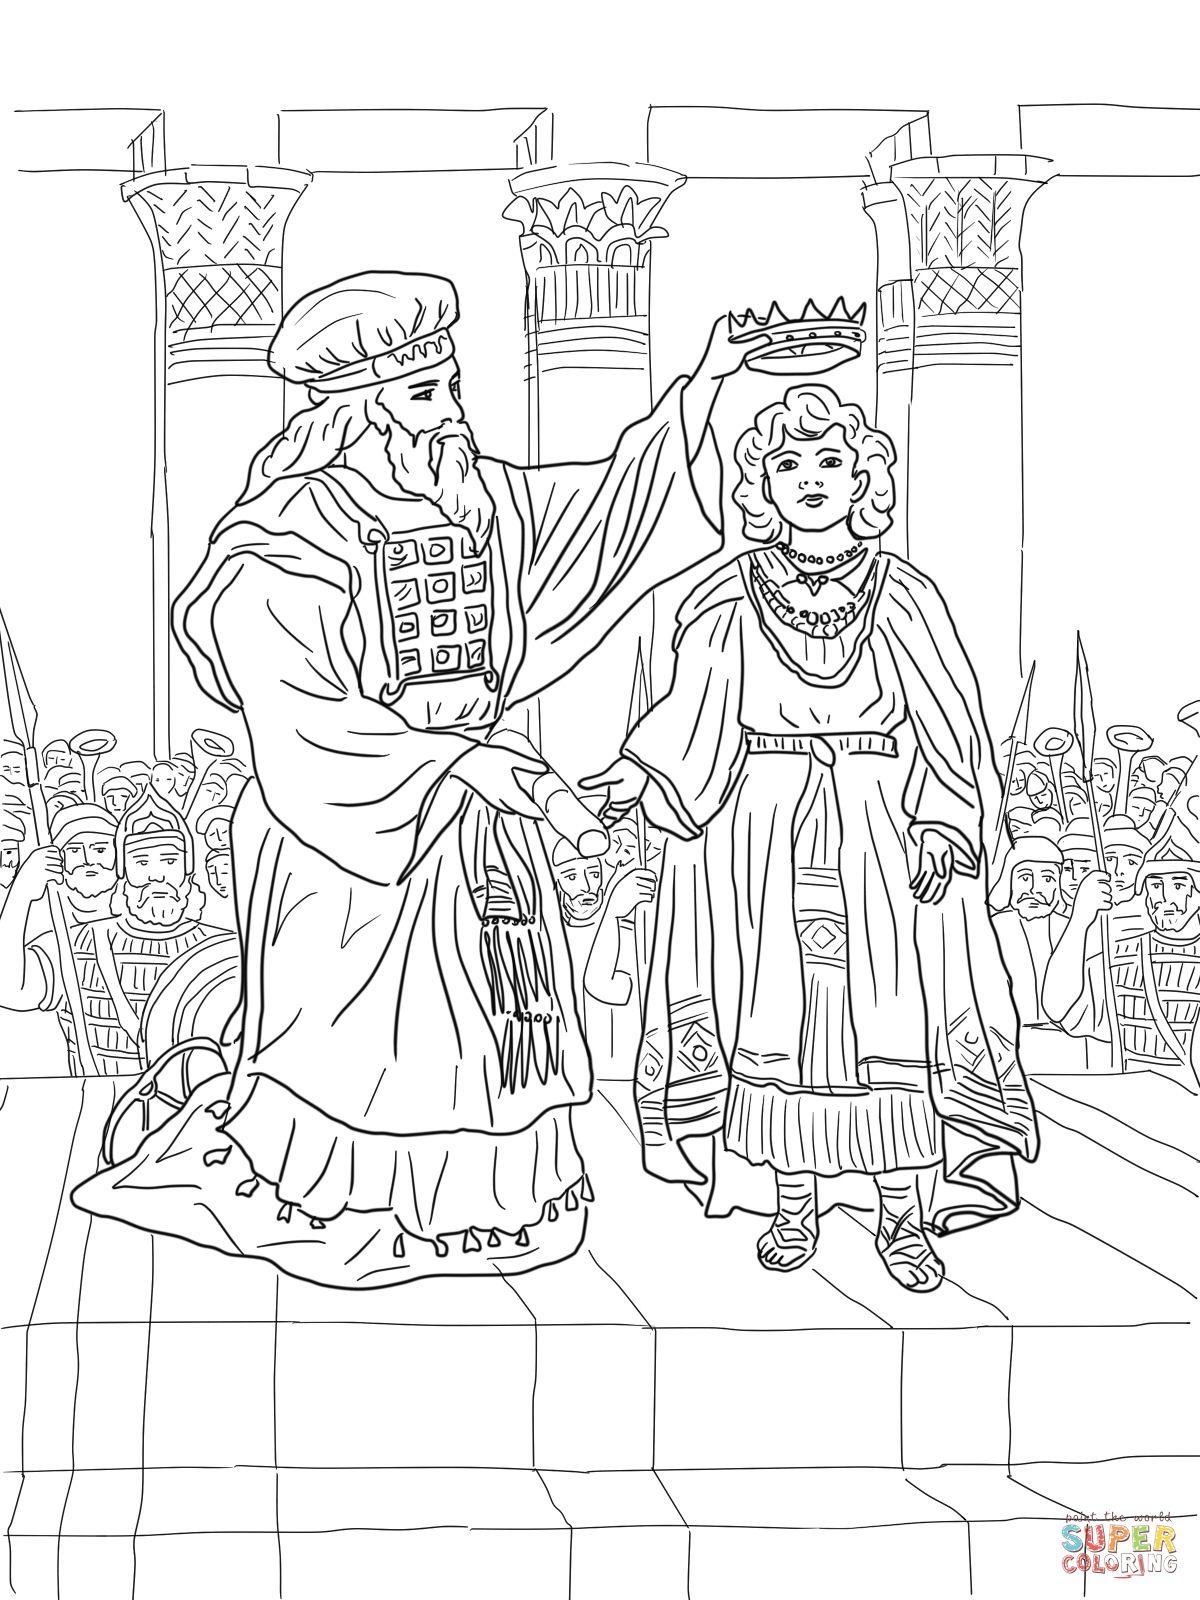 King Joash Crowned Coloring Page Supercoloring Com Bible